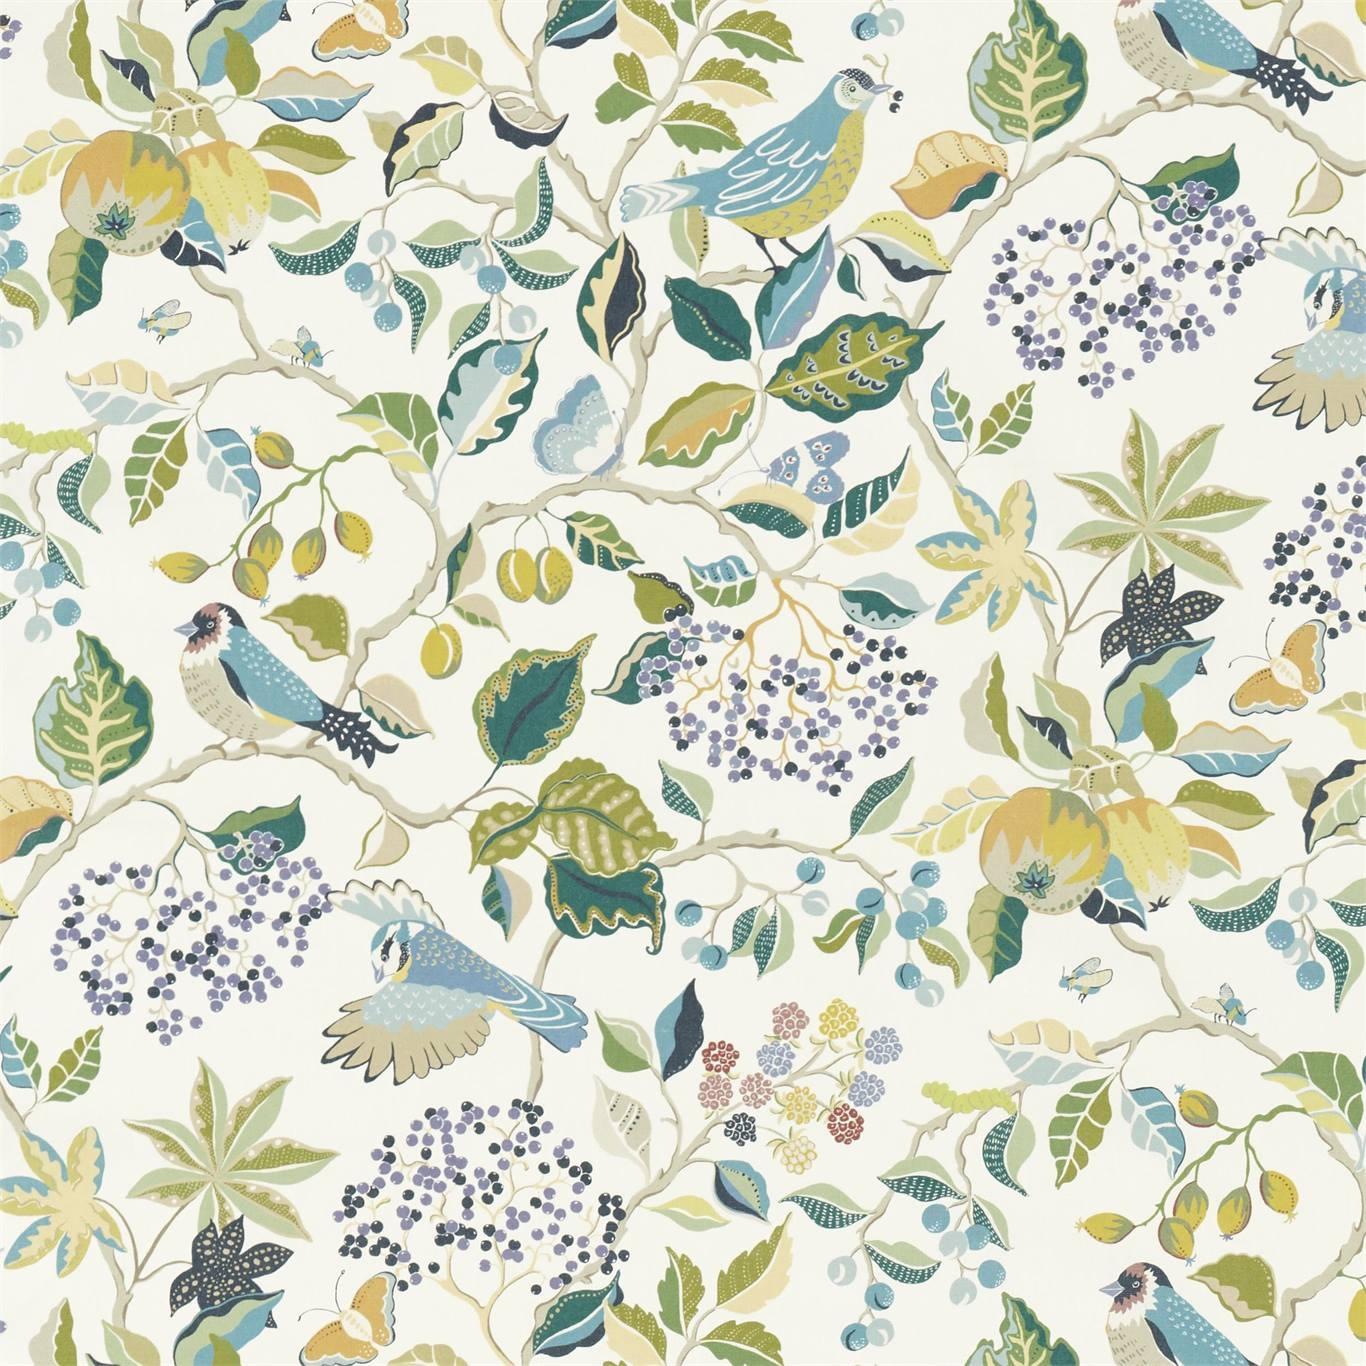 Image of Sanderson Birds & Berries Southwold Blue Fabric 226728